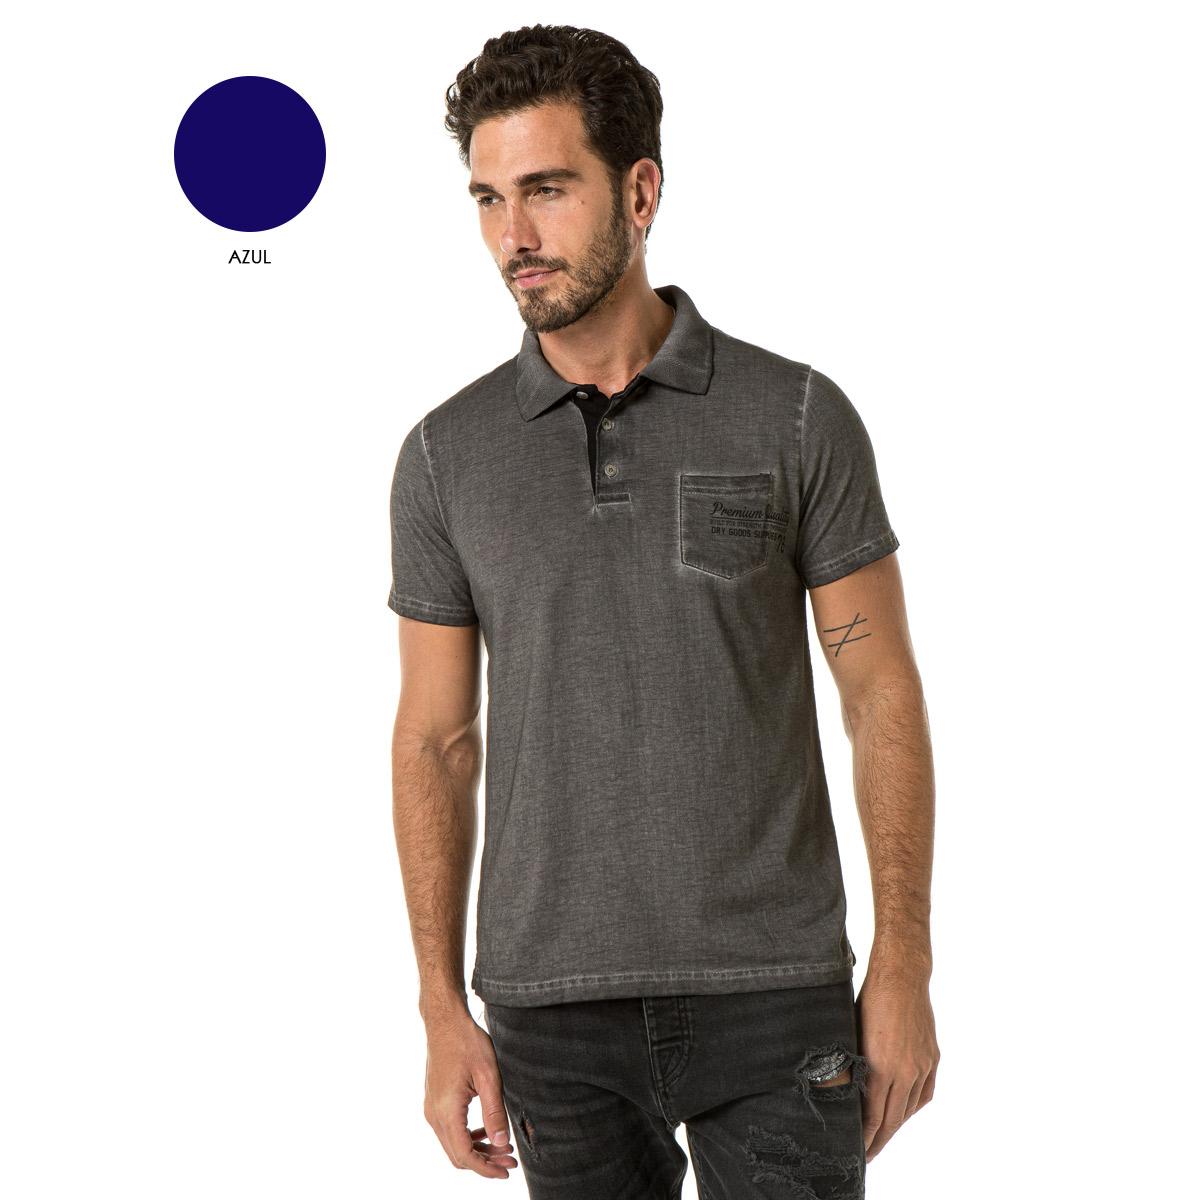 Camiseta Polo Masculina Sba 22185